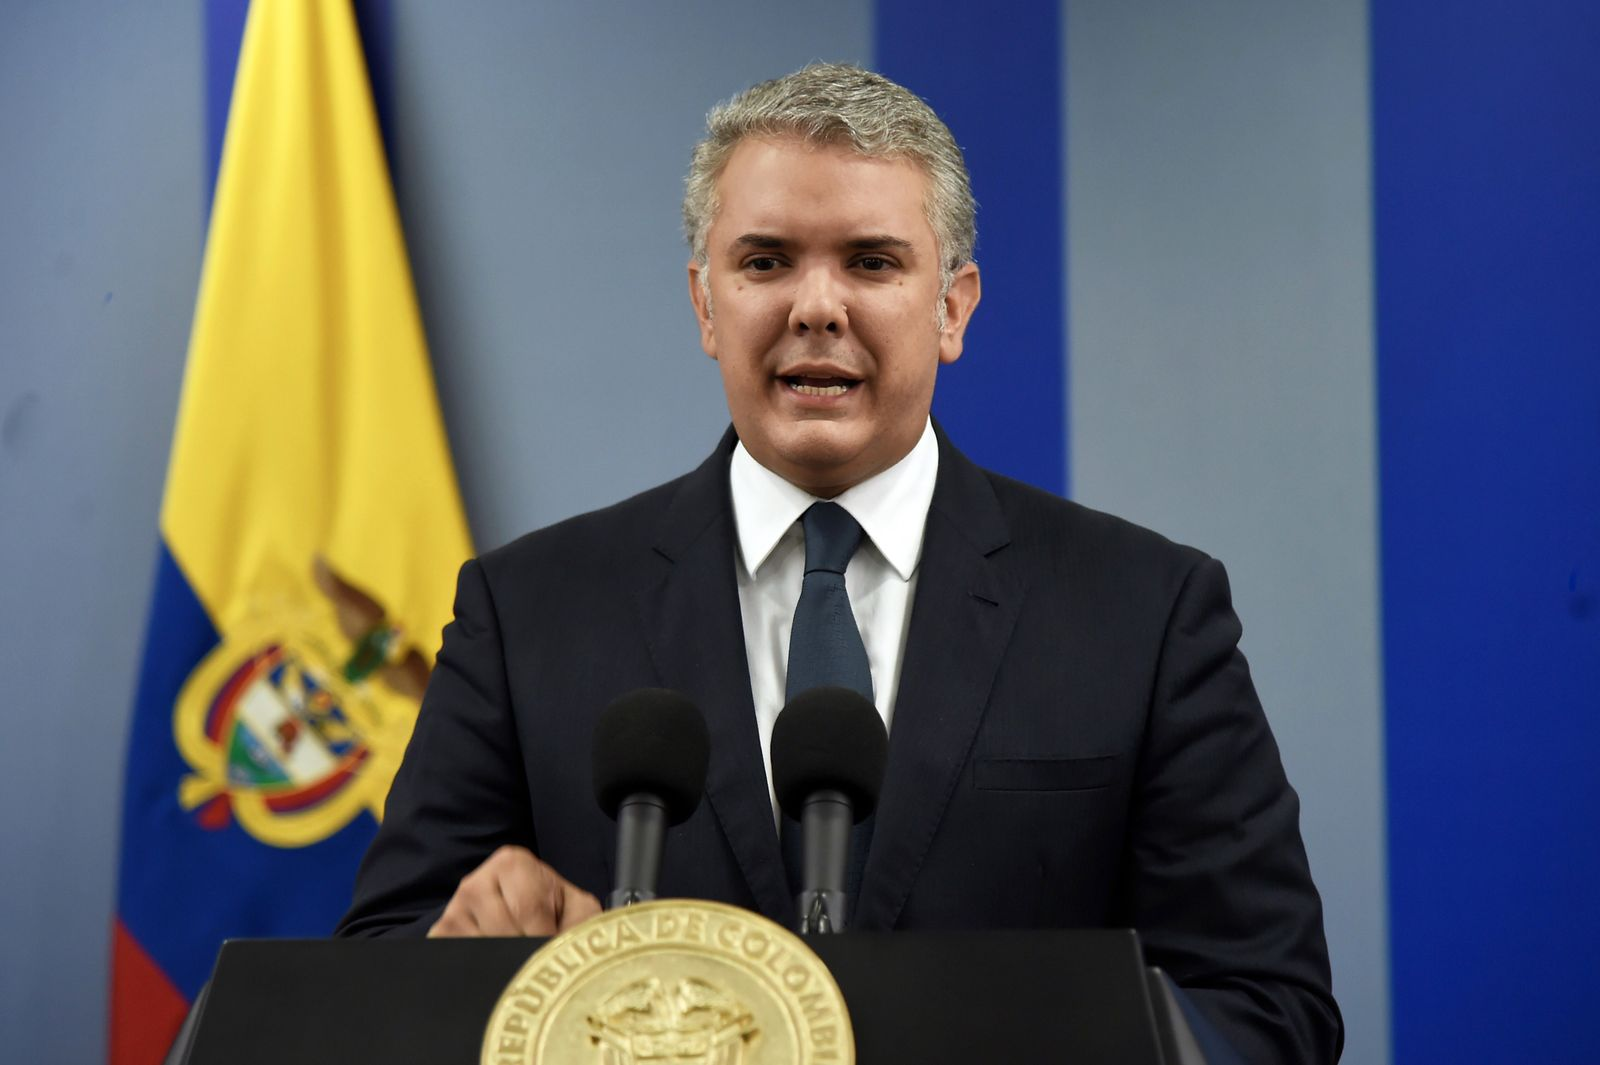 Iván Duque/ Kolumbien